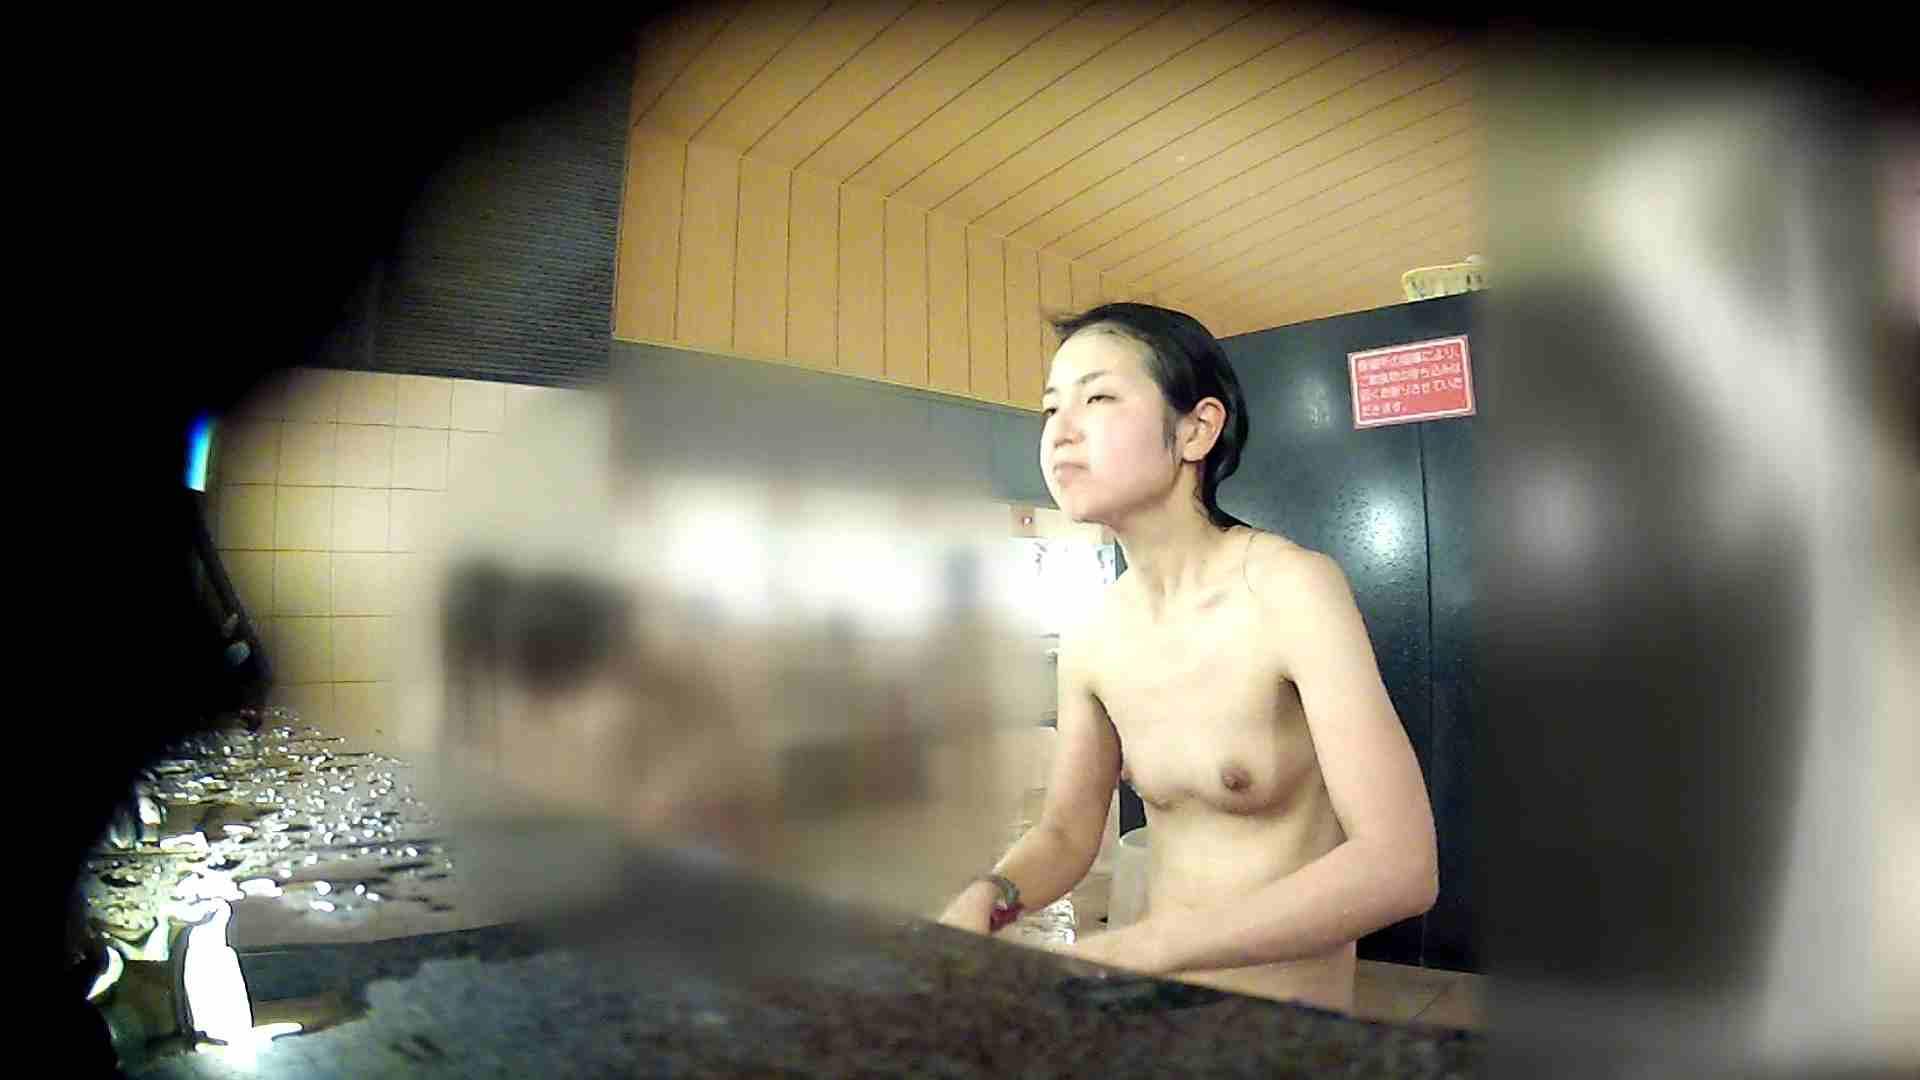 潜入女盗撮師のスーパー銭湯 Vol.01 銭湯 | 盗撮  45画像 26